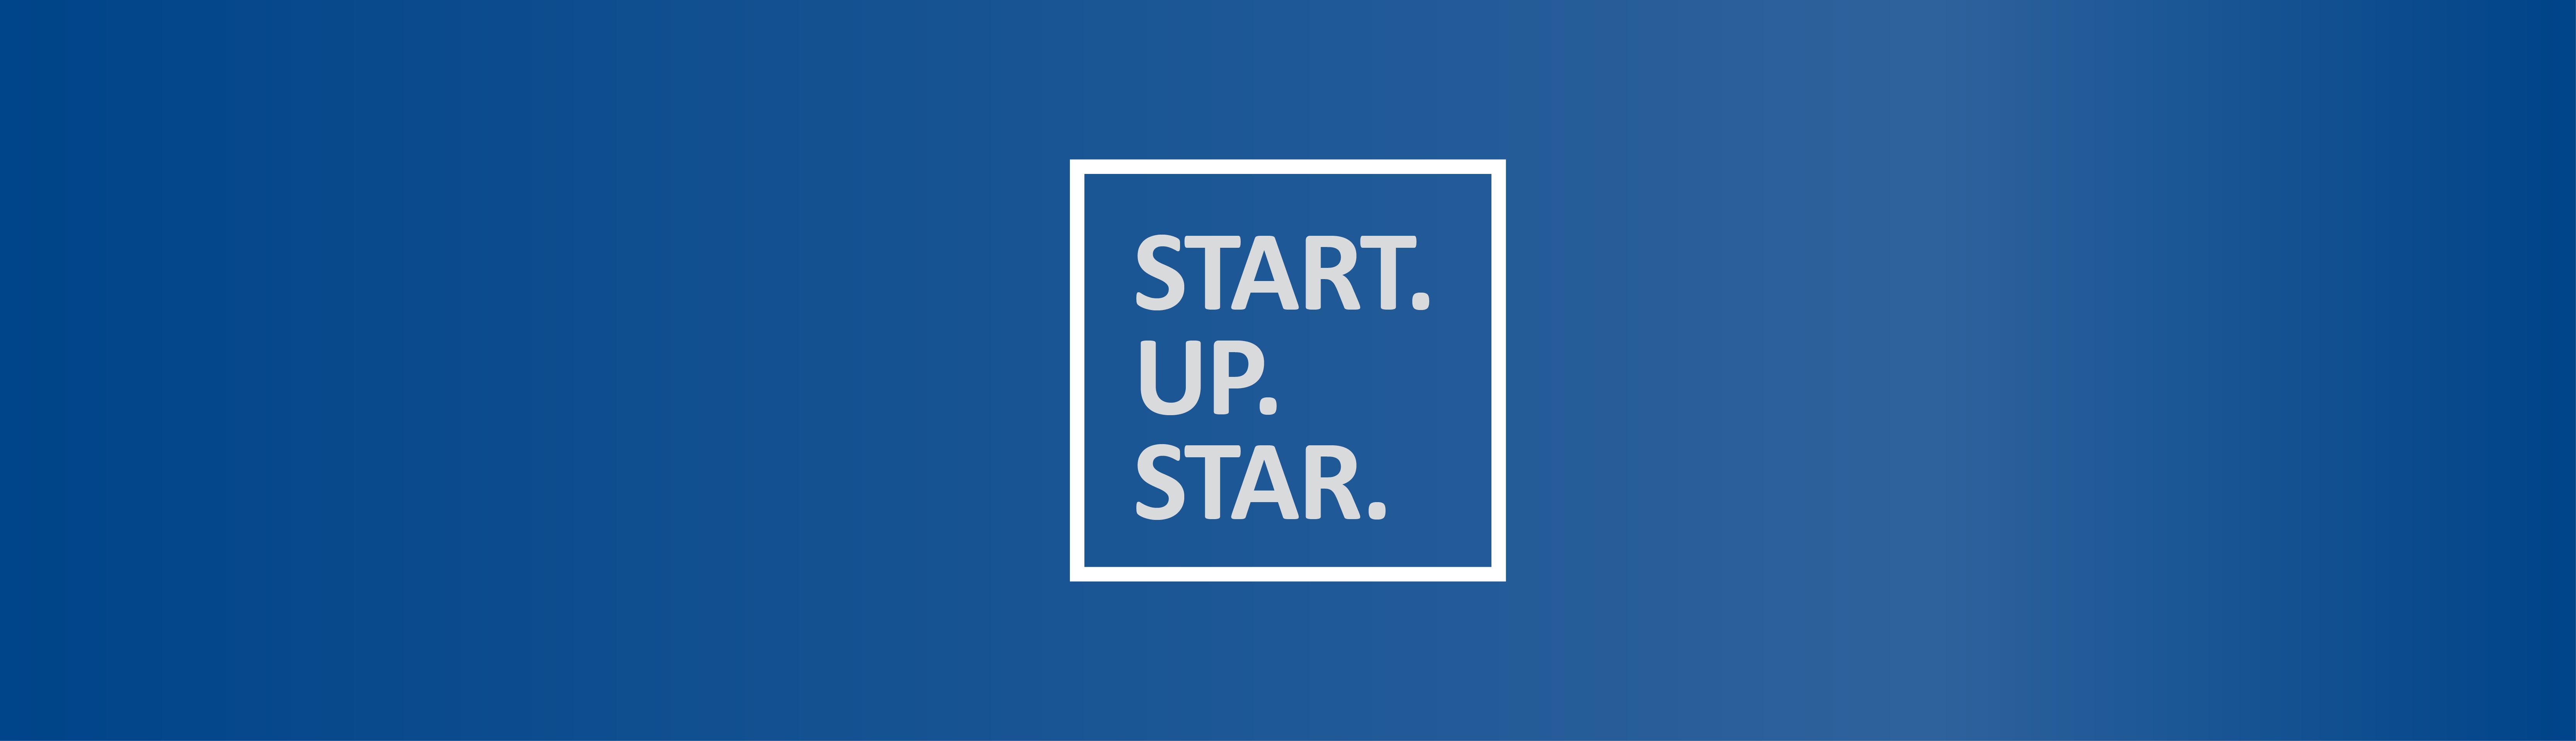 START.UP.STAR.